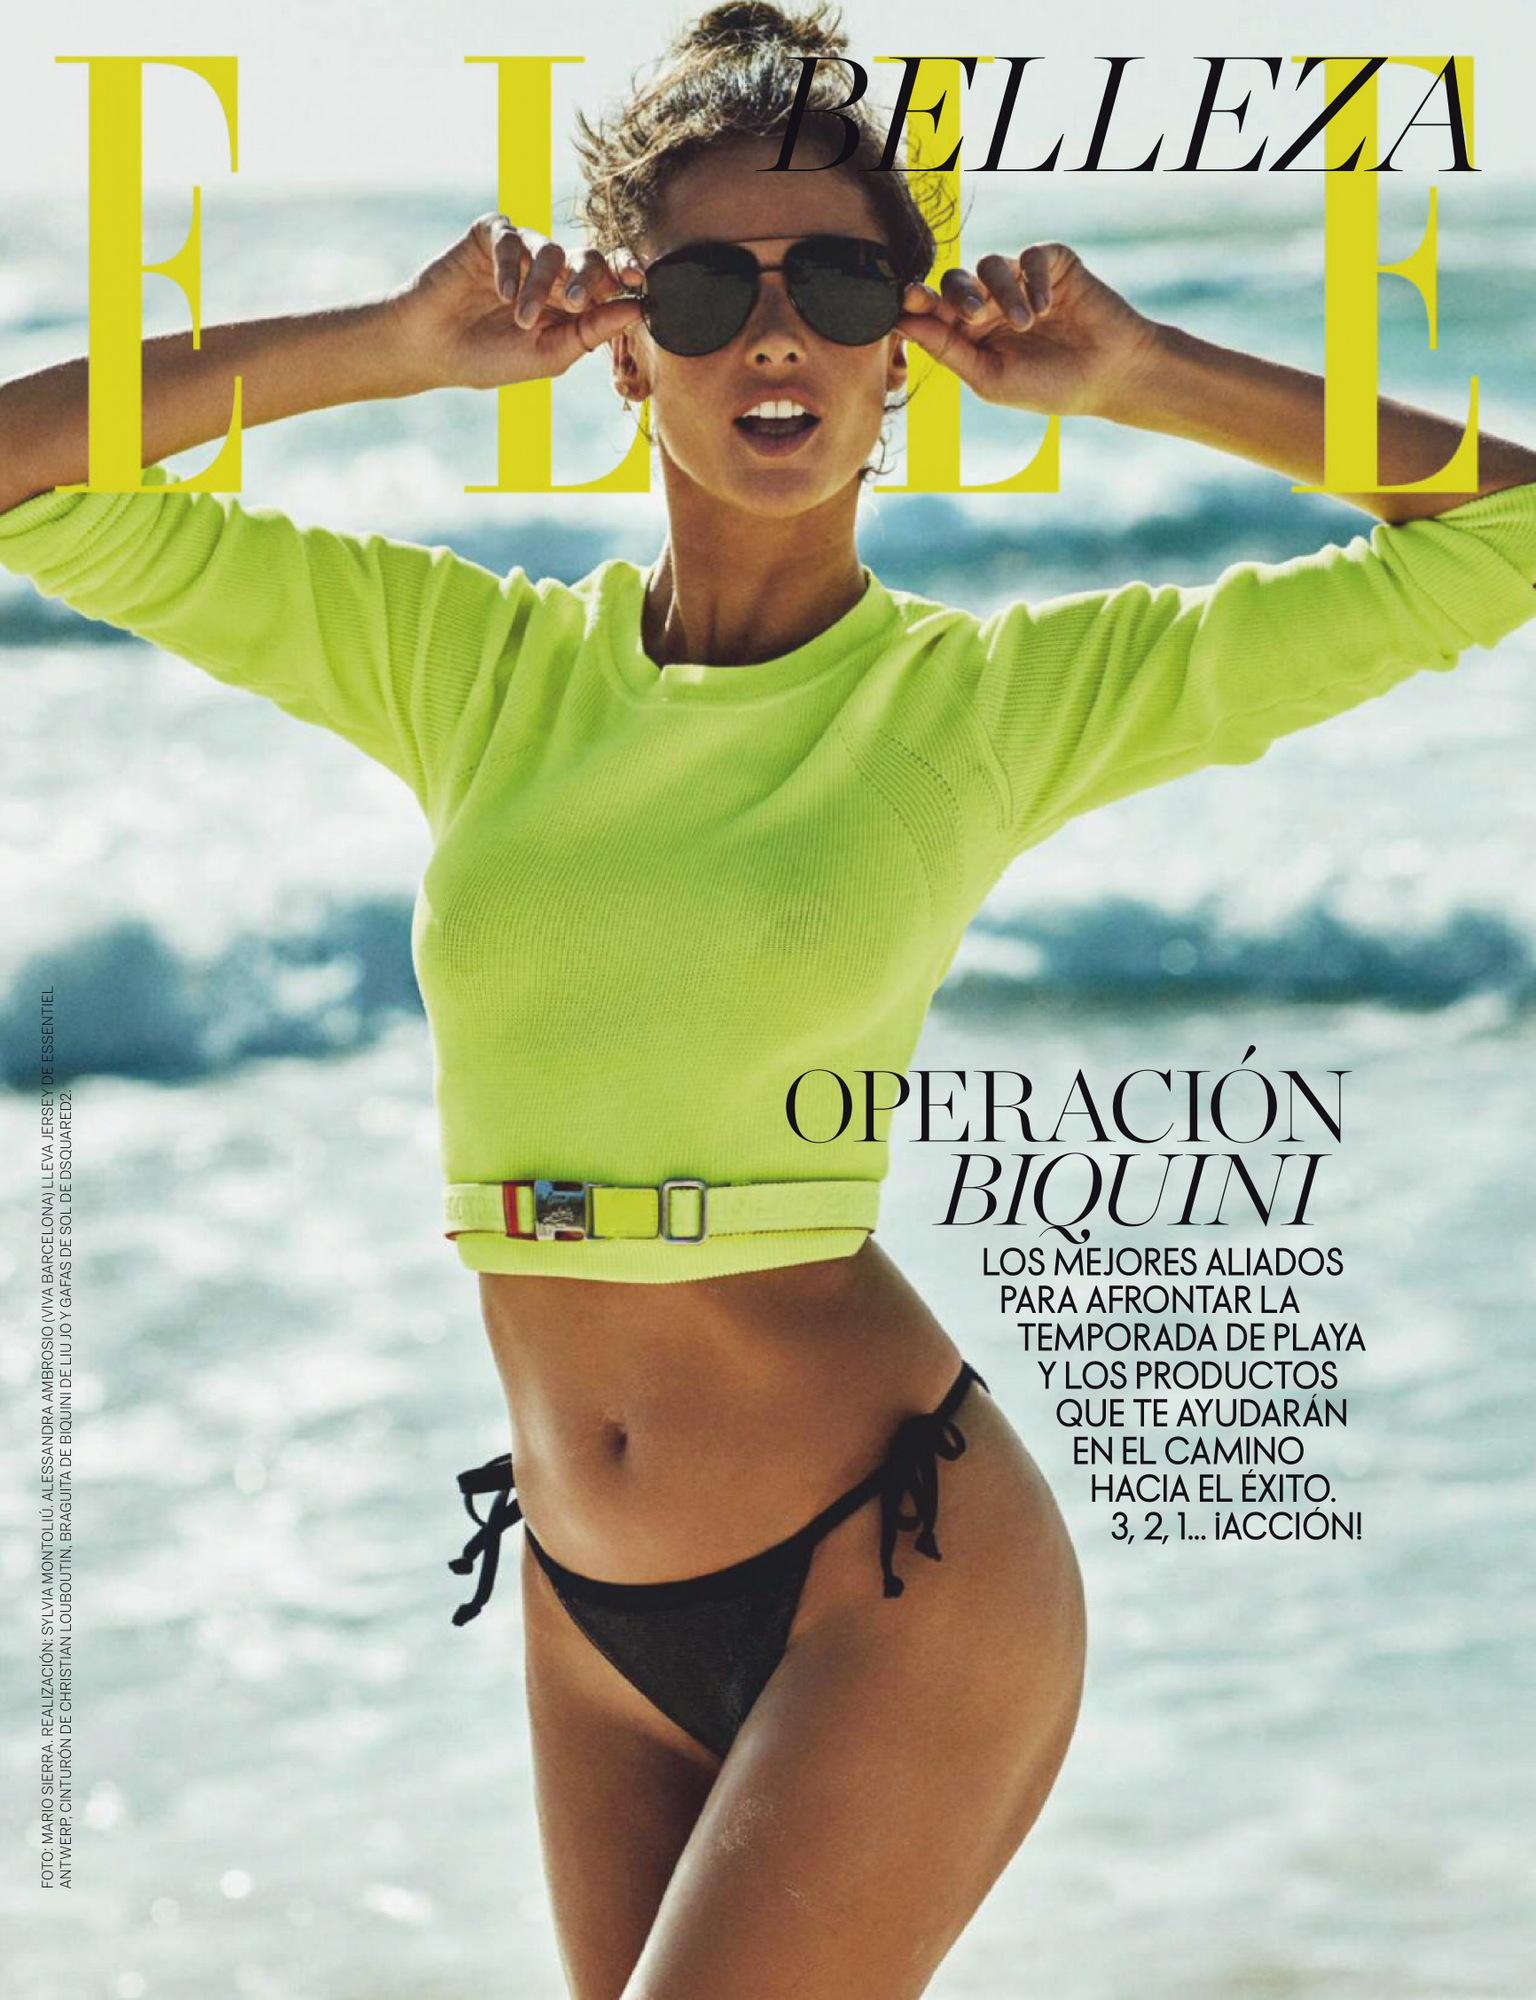 Alessandra Ambrosio – Beautiful Boobs In Sexy Photoshoot For Elle Spain Magazine (june 2020) 0002